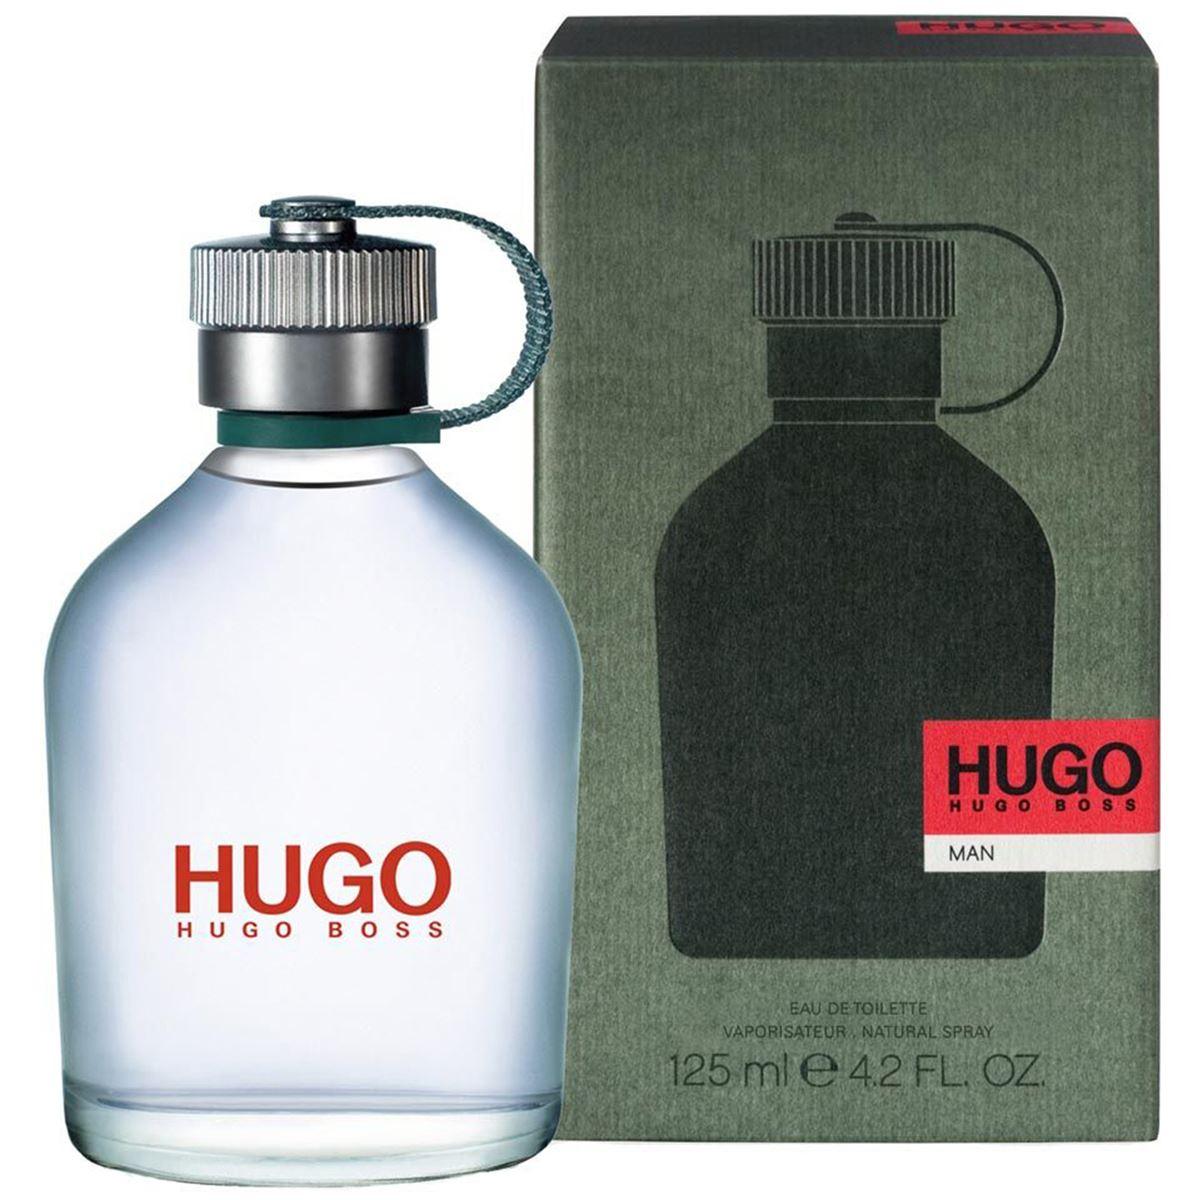 Hugo boss eau de toilette 125ml vaporizador